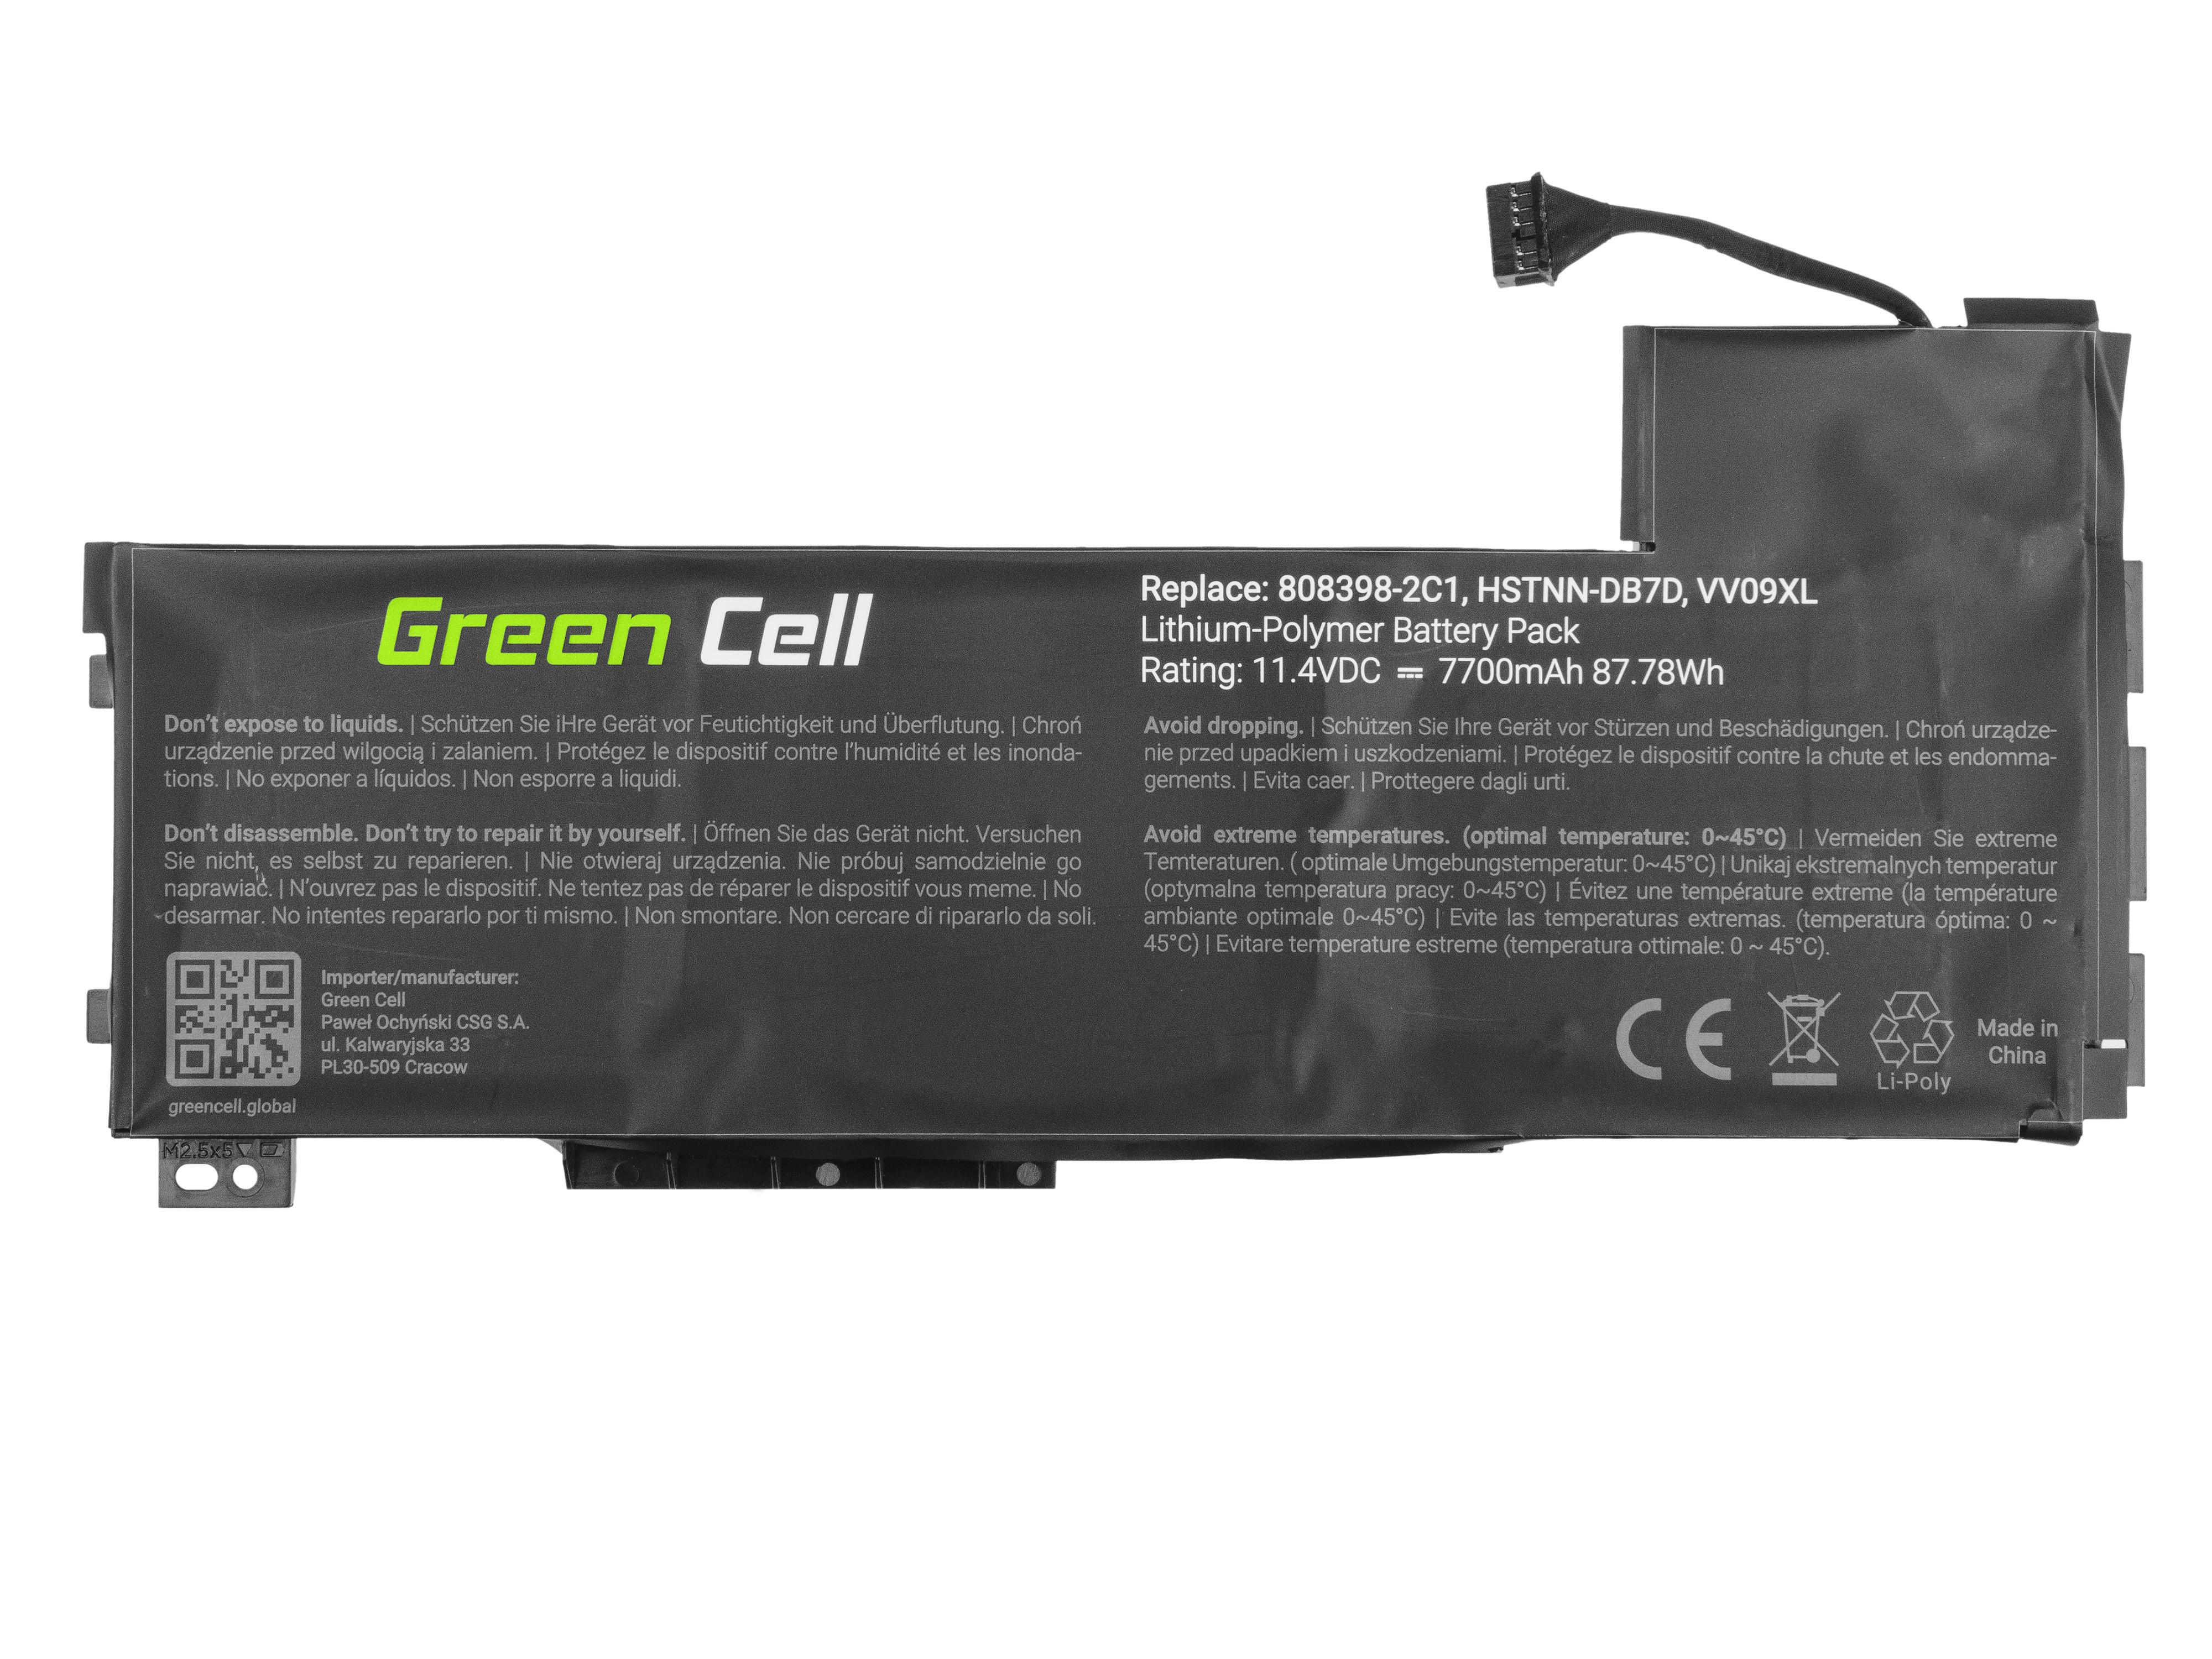 Green Cell HP136 Baterie HP VV09XL HP ZBook 15 G3 G4 7700mAh Li-Pol - neoriginální